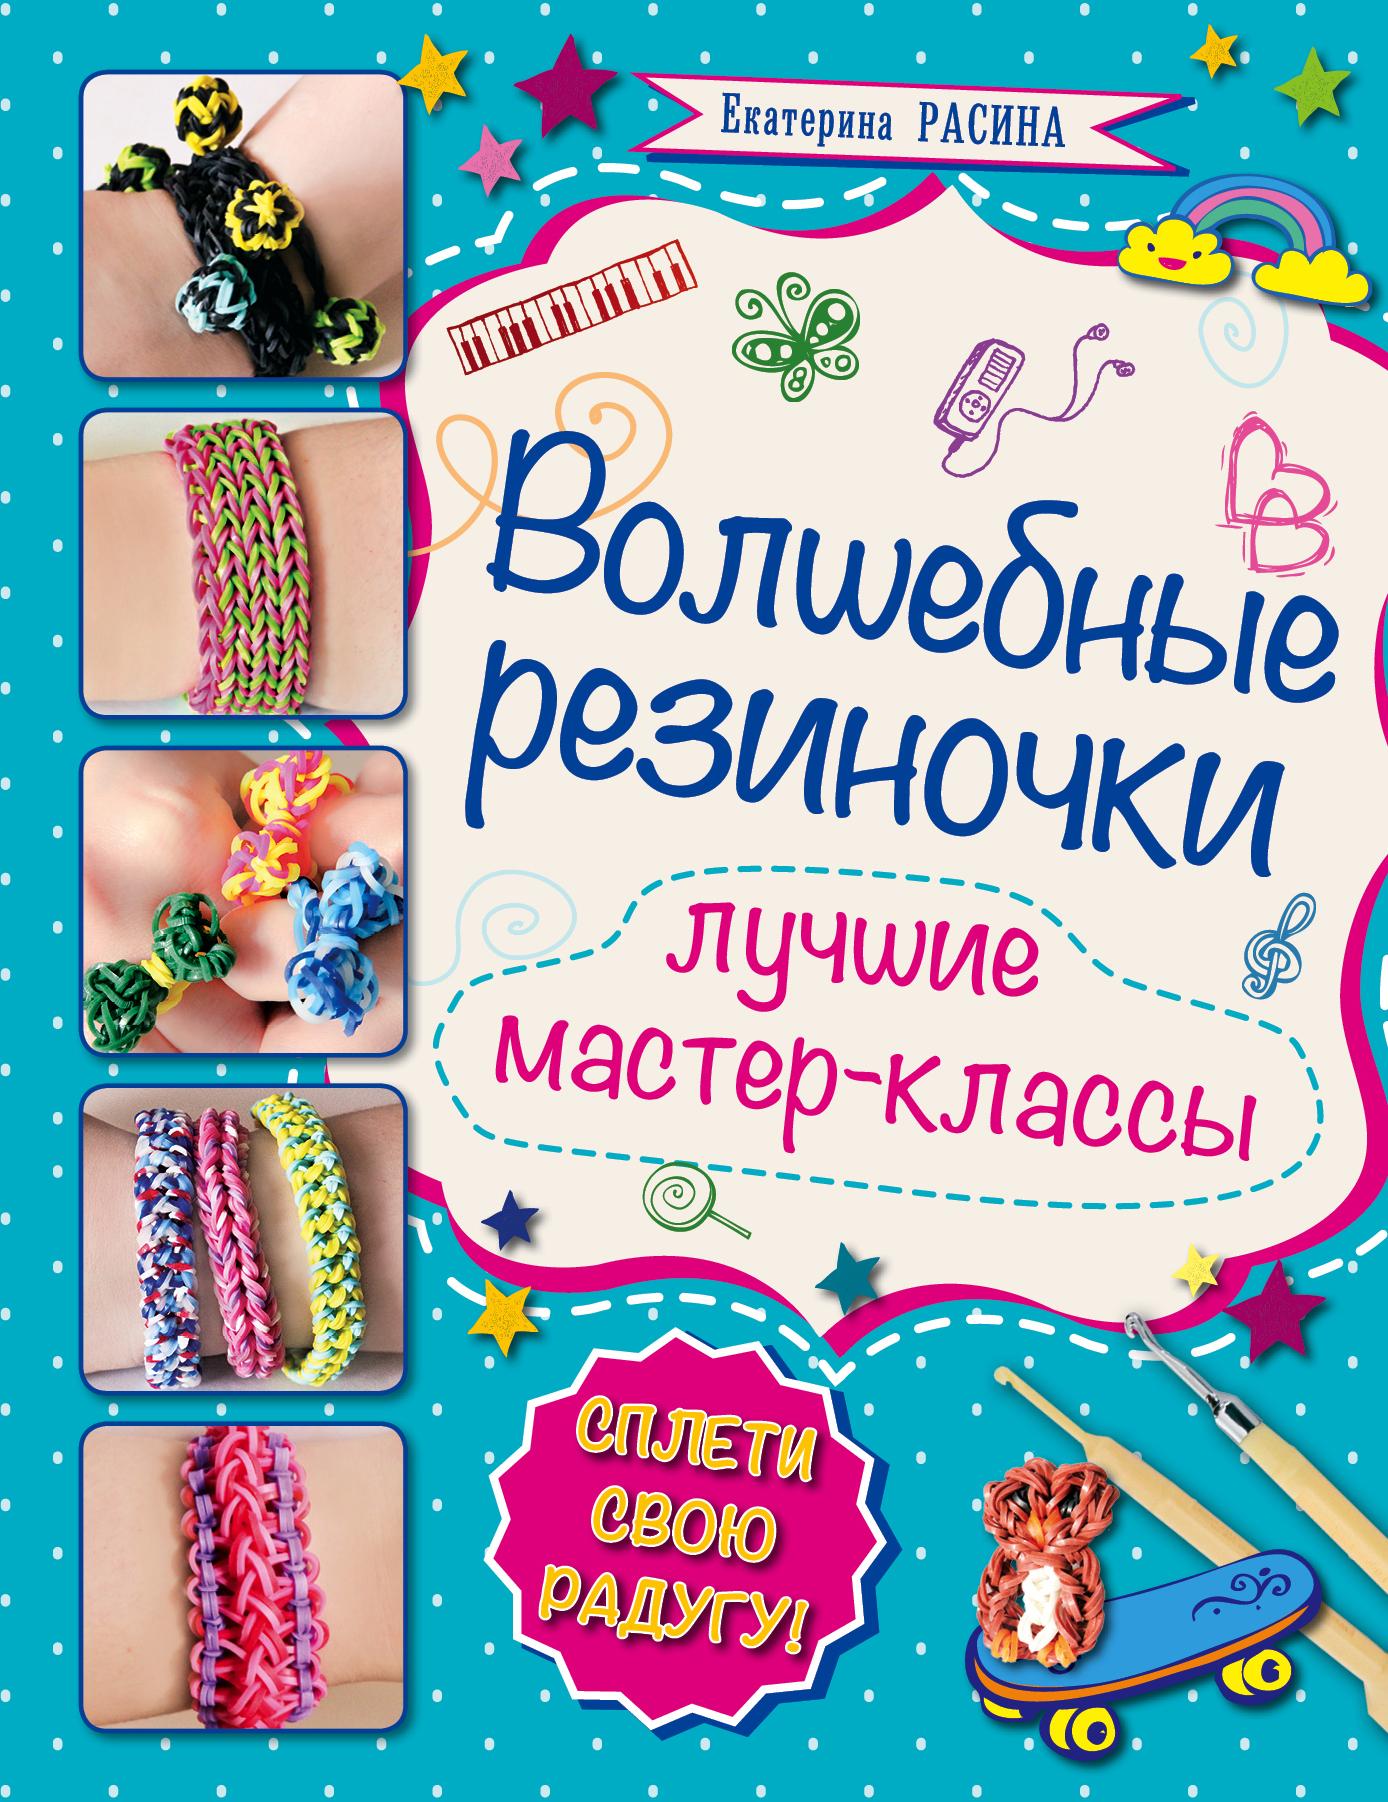 Волшебные резиночки ( Расина Е.Г.  )